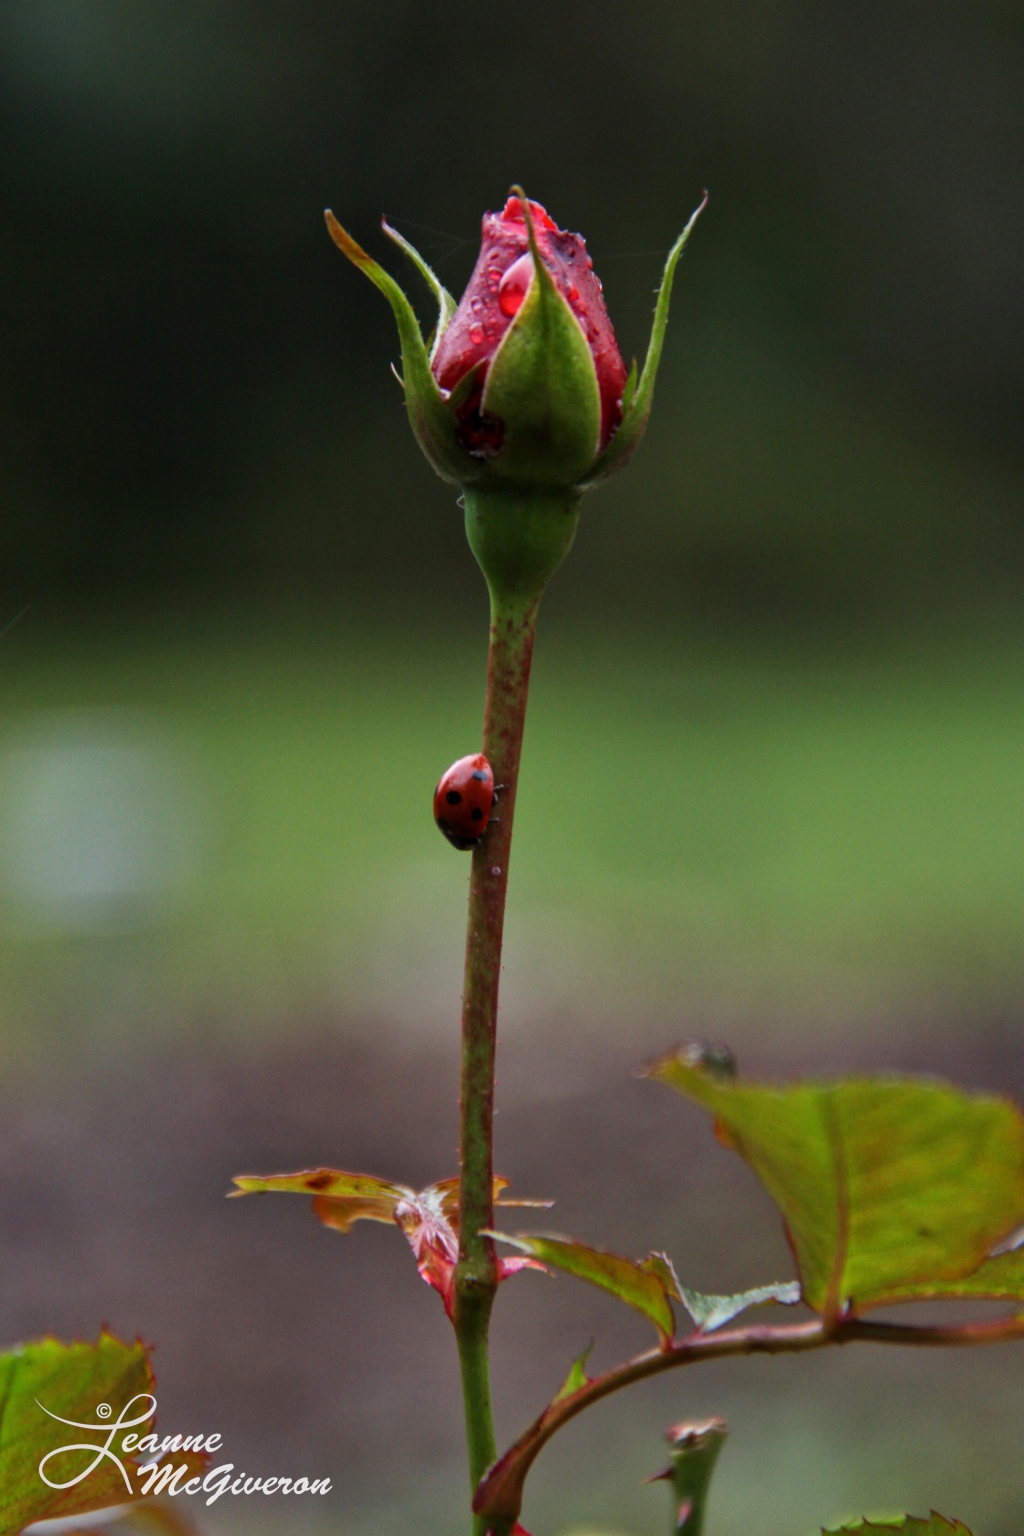 Rose & a Ladybird